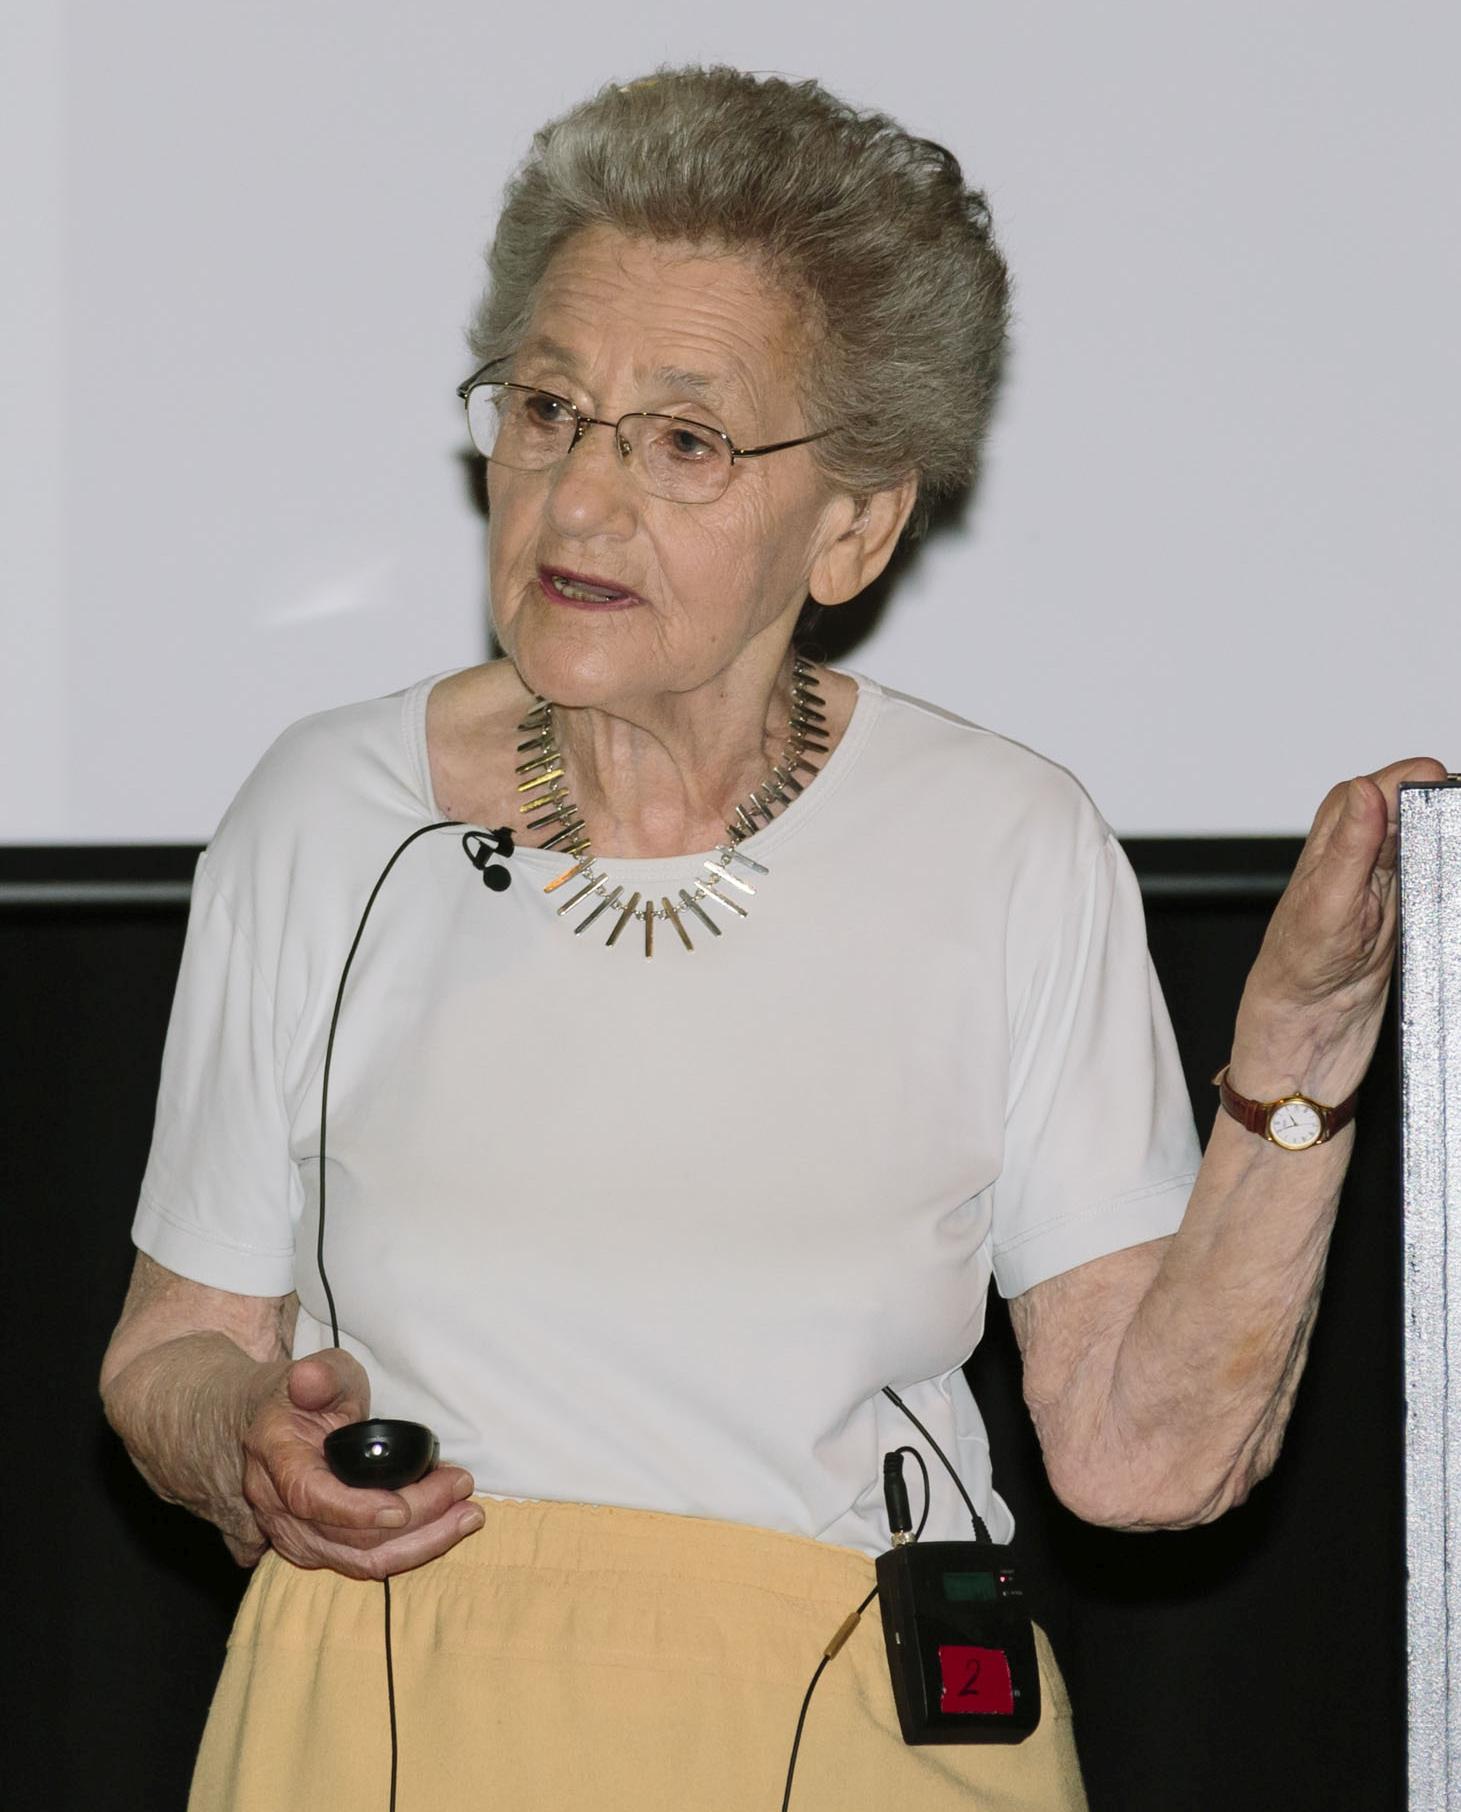 Olga Kennard